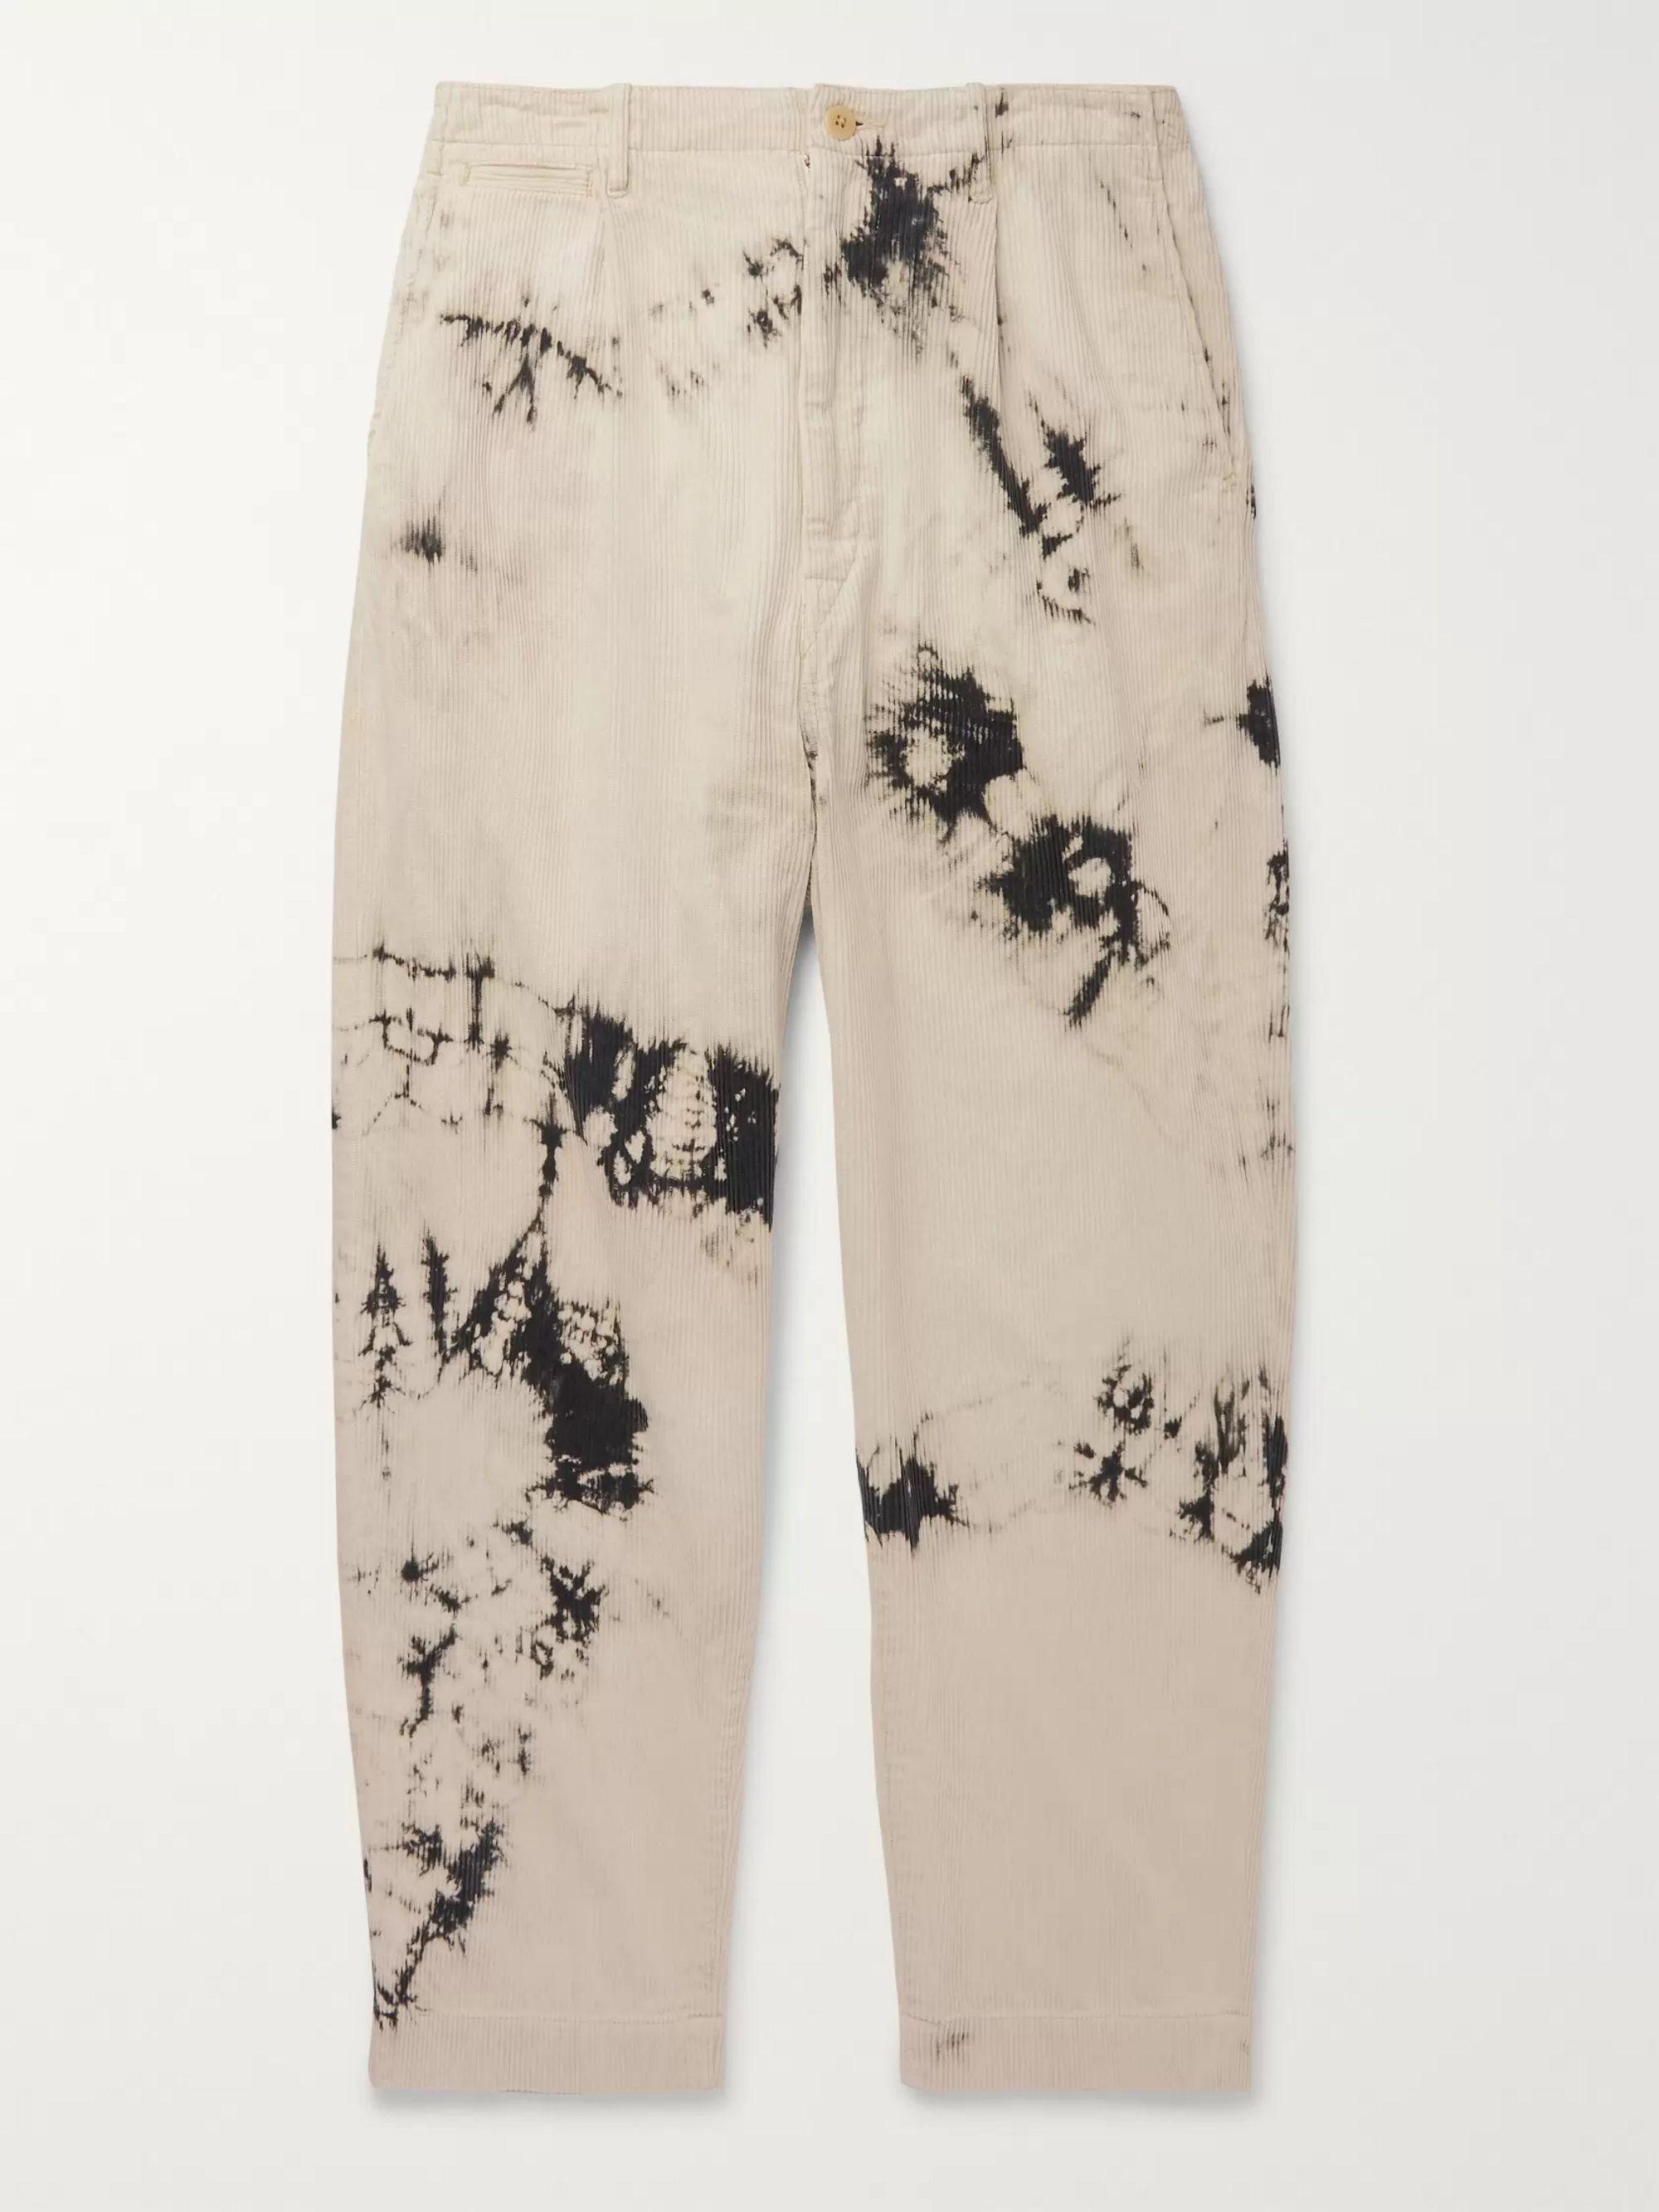 Ashbury Wide Leg Tie Dyed Cotton Corduroy Trousers by Kapital